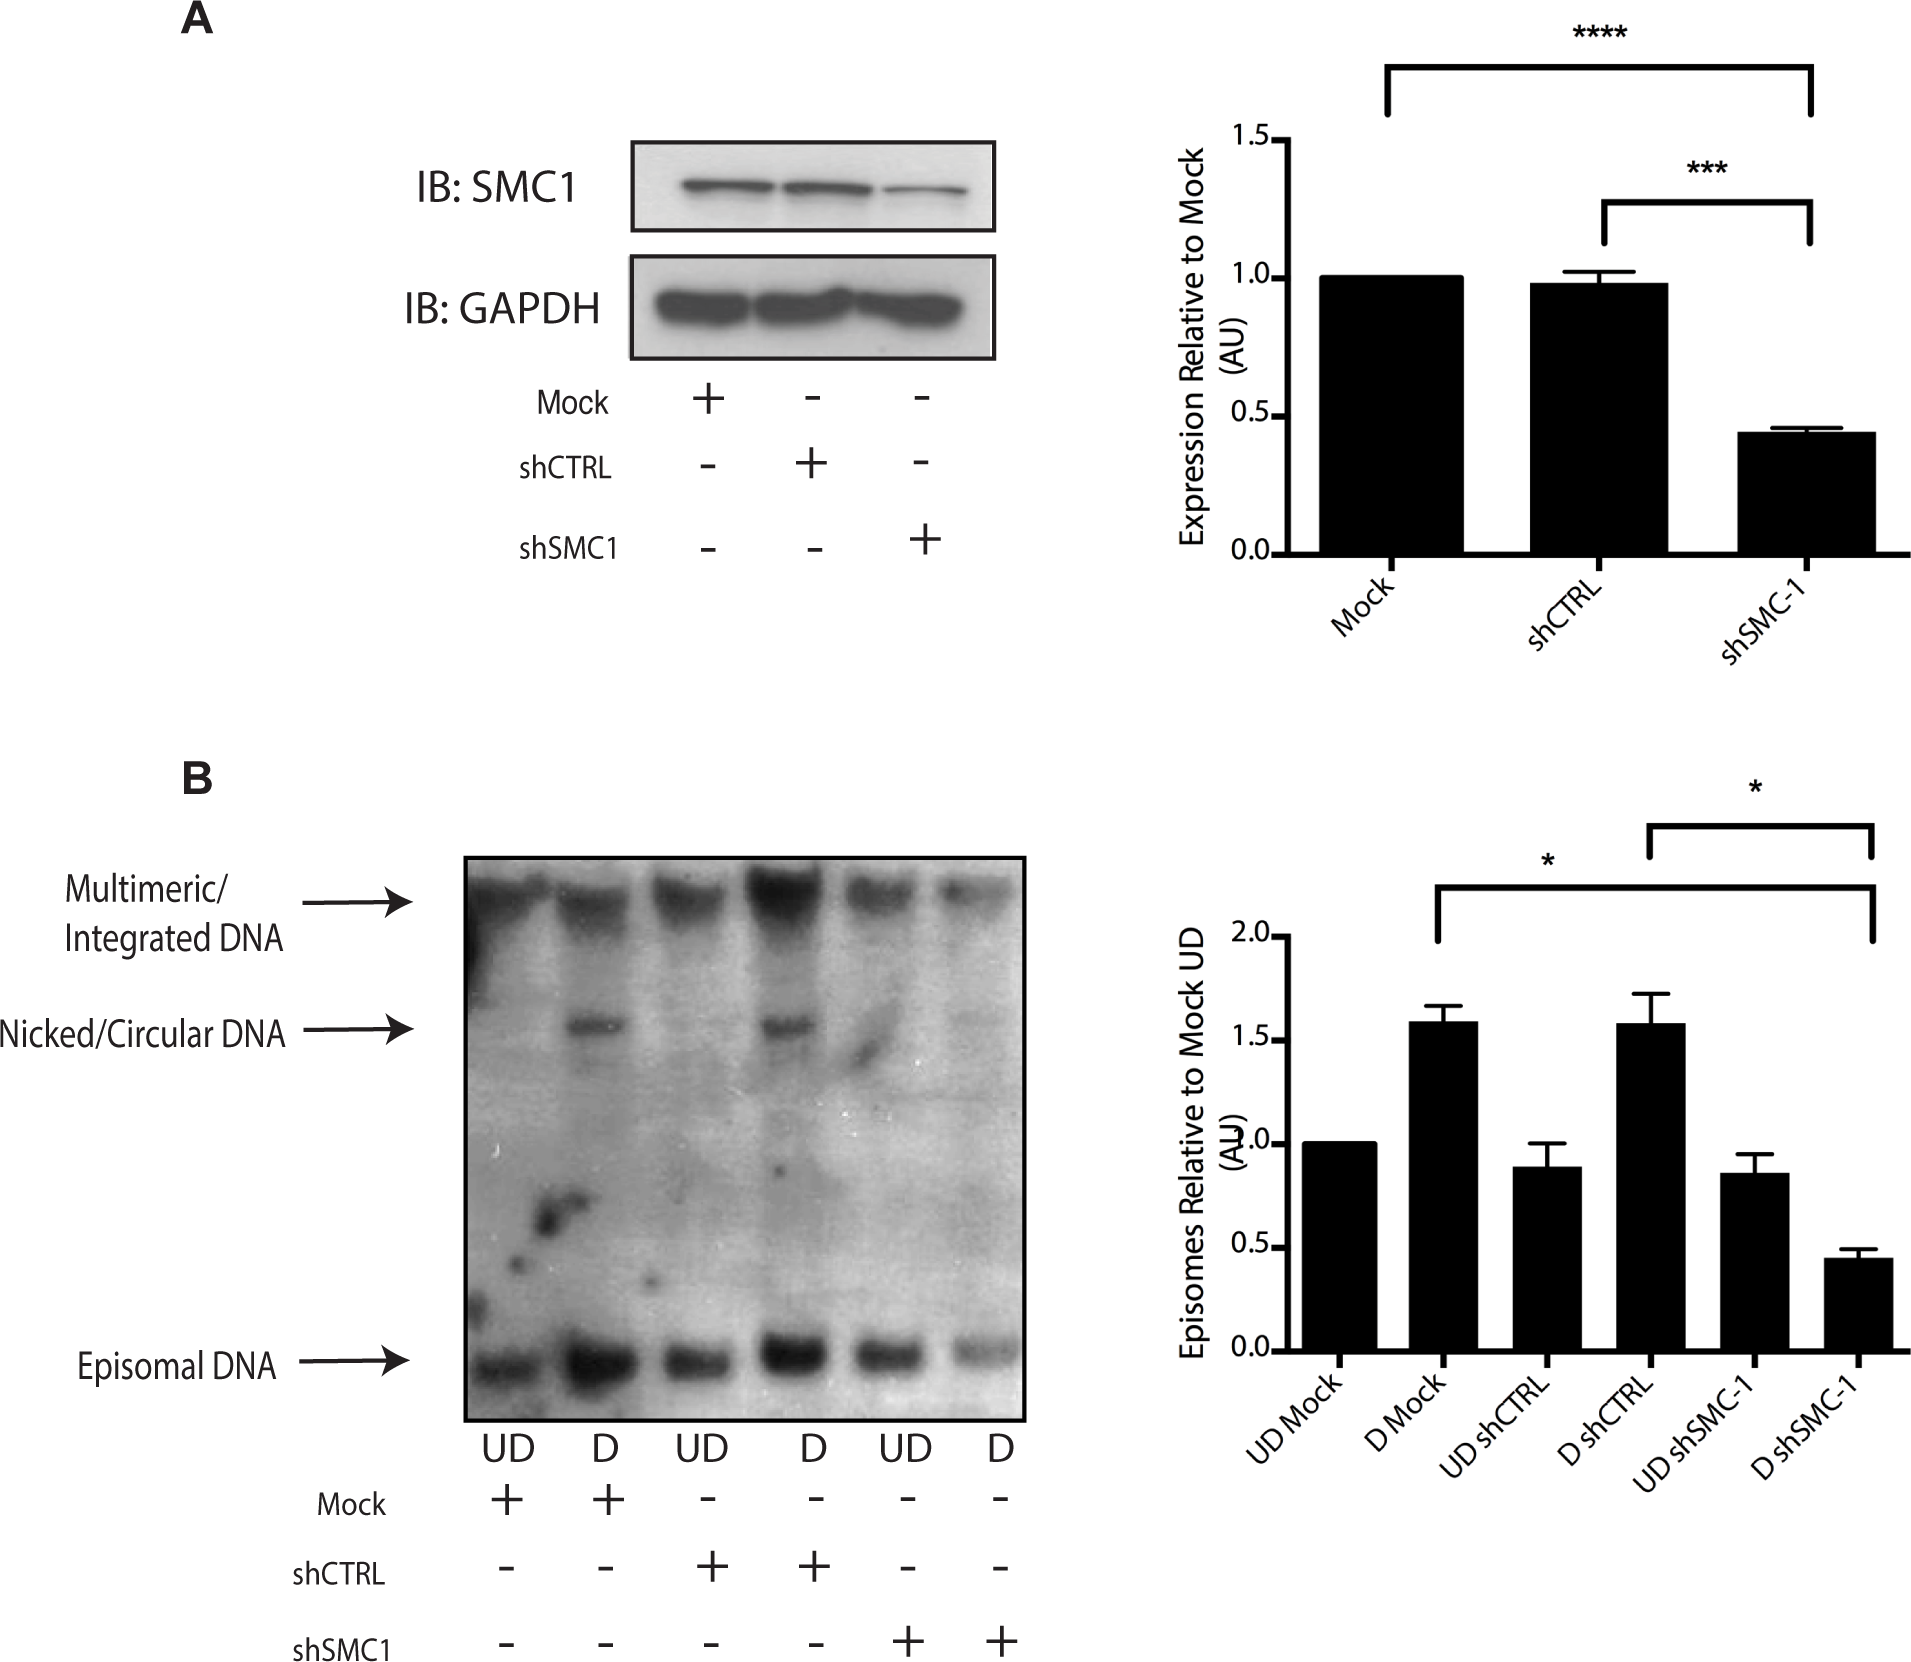 Knockdown of SMC1 with shRNA blocks viral genome amplification.